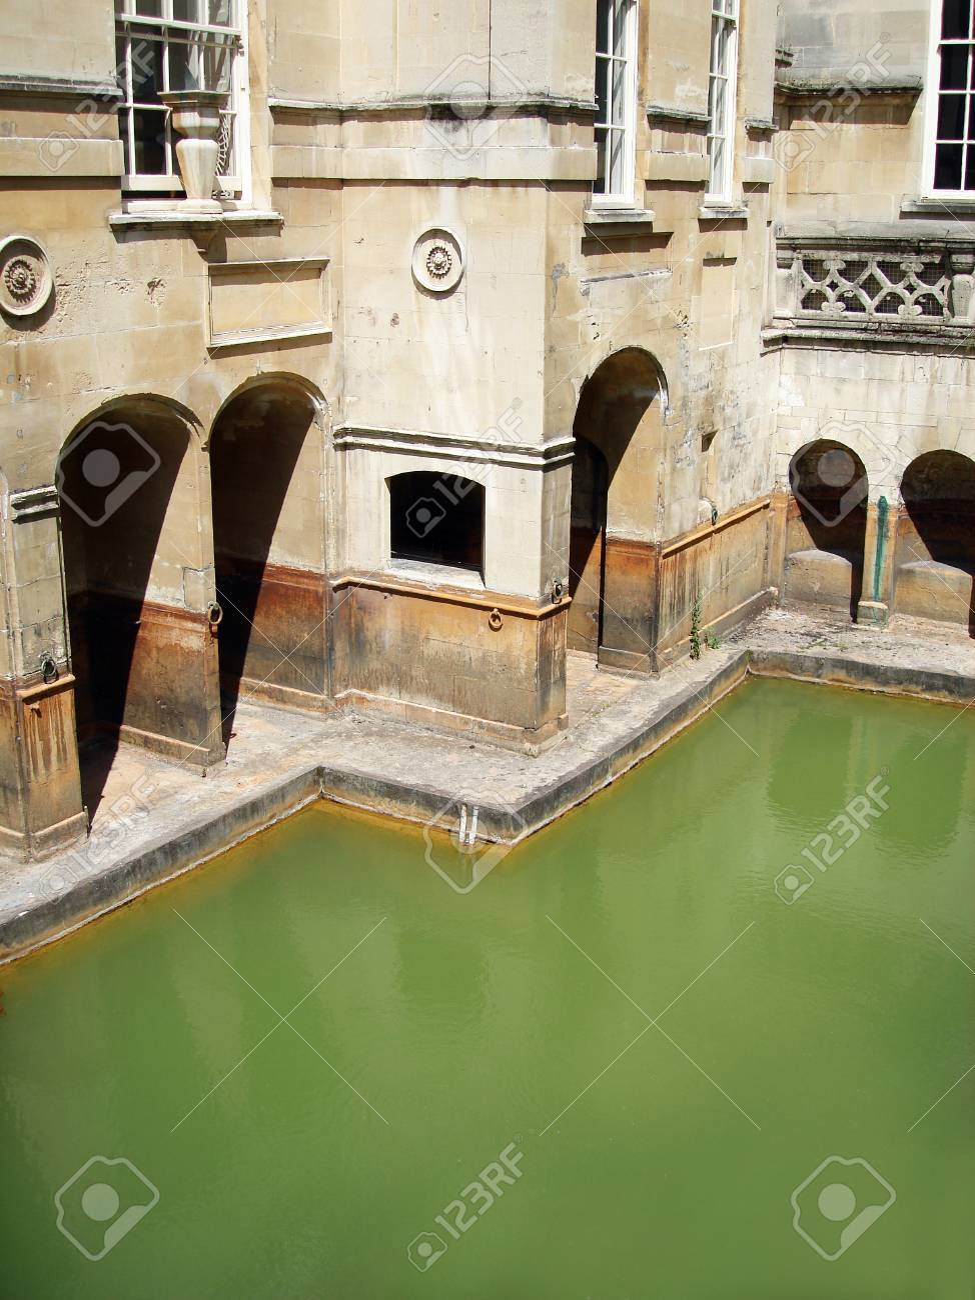 Roman Baths of Bath, England, UK                          Stock Photo - 11886719